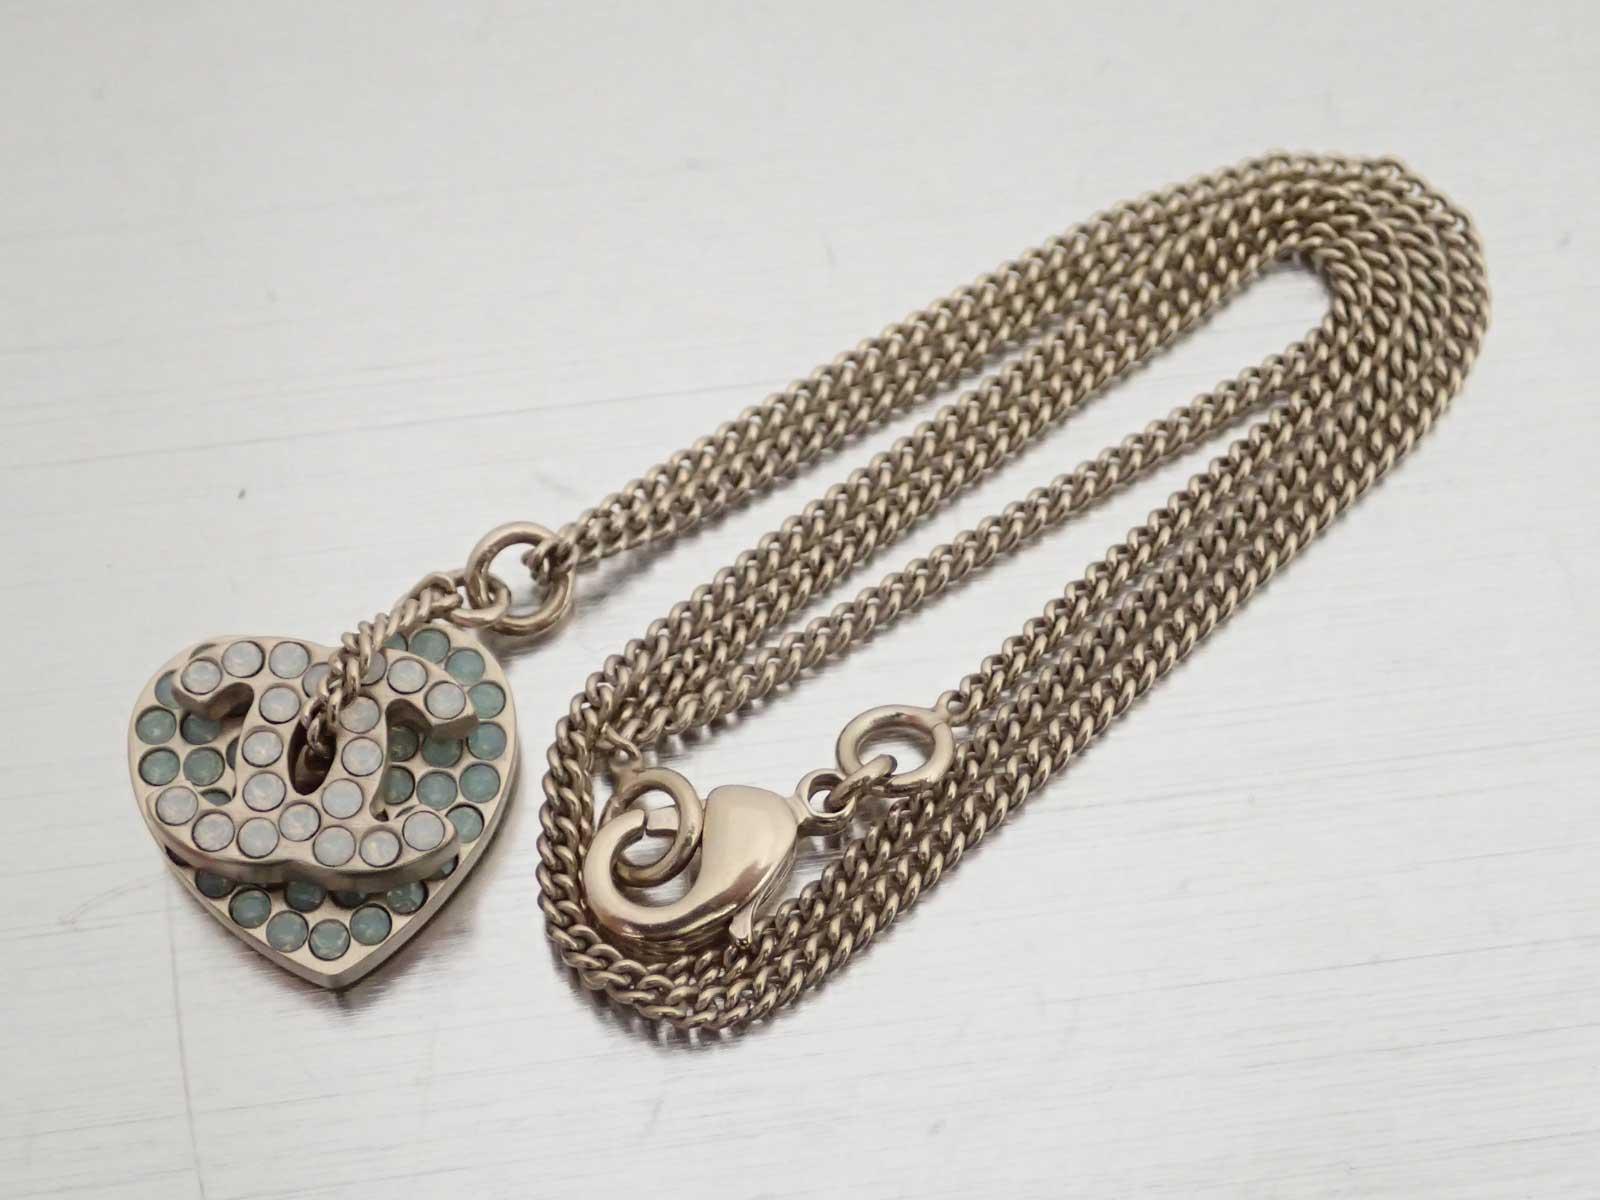 df4bdc4fc Details about Auth CHANEL CC Logo Chain Necklace Blue/Goldtone  Rhinestone/Metal - e38365